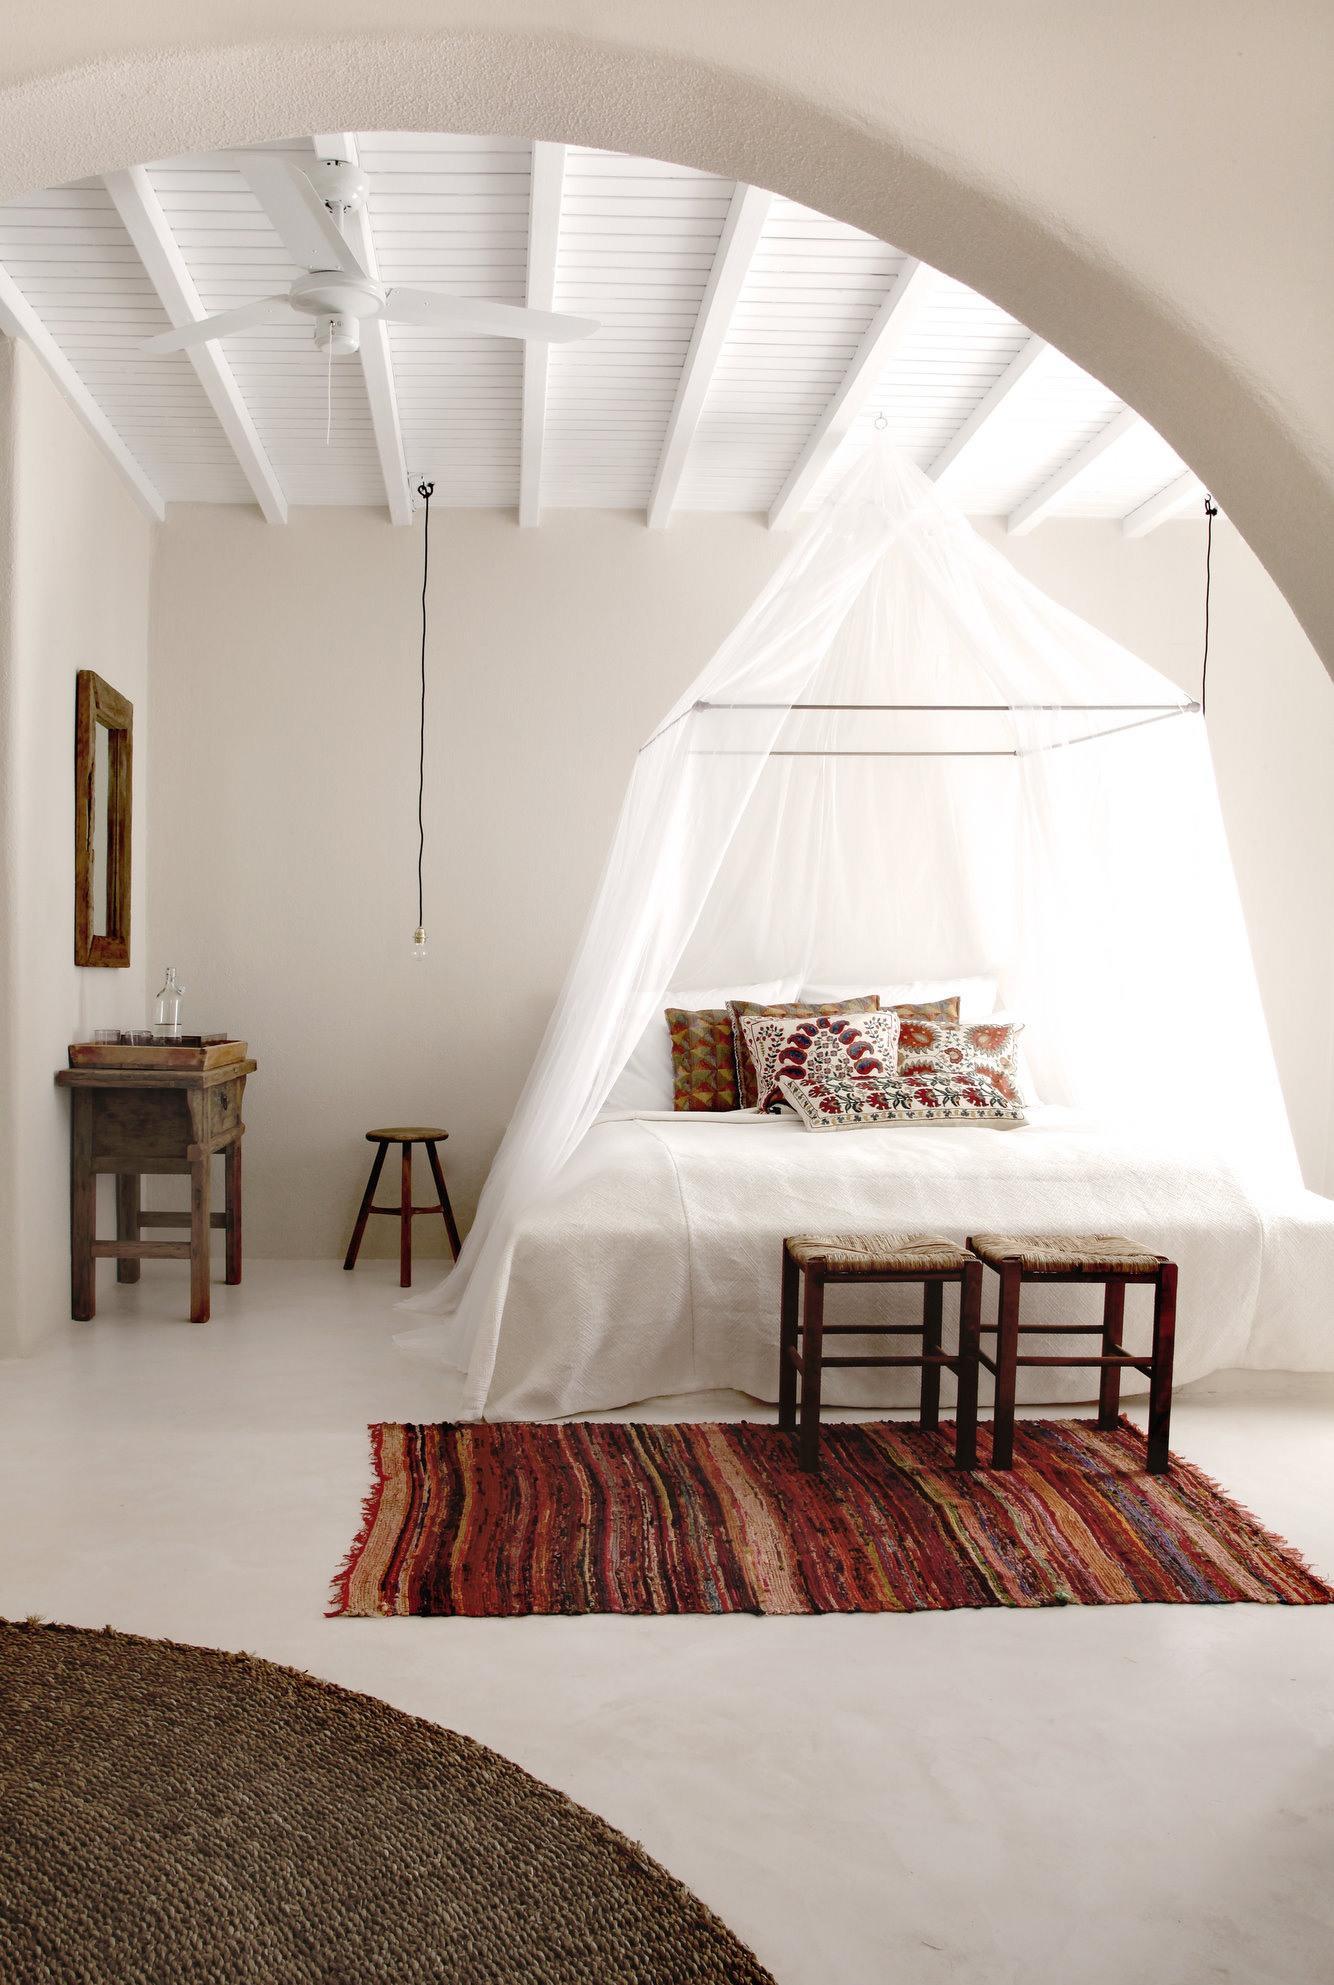 Подвесной балдахин над кроватью